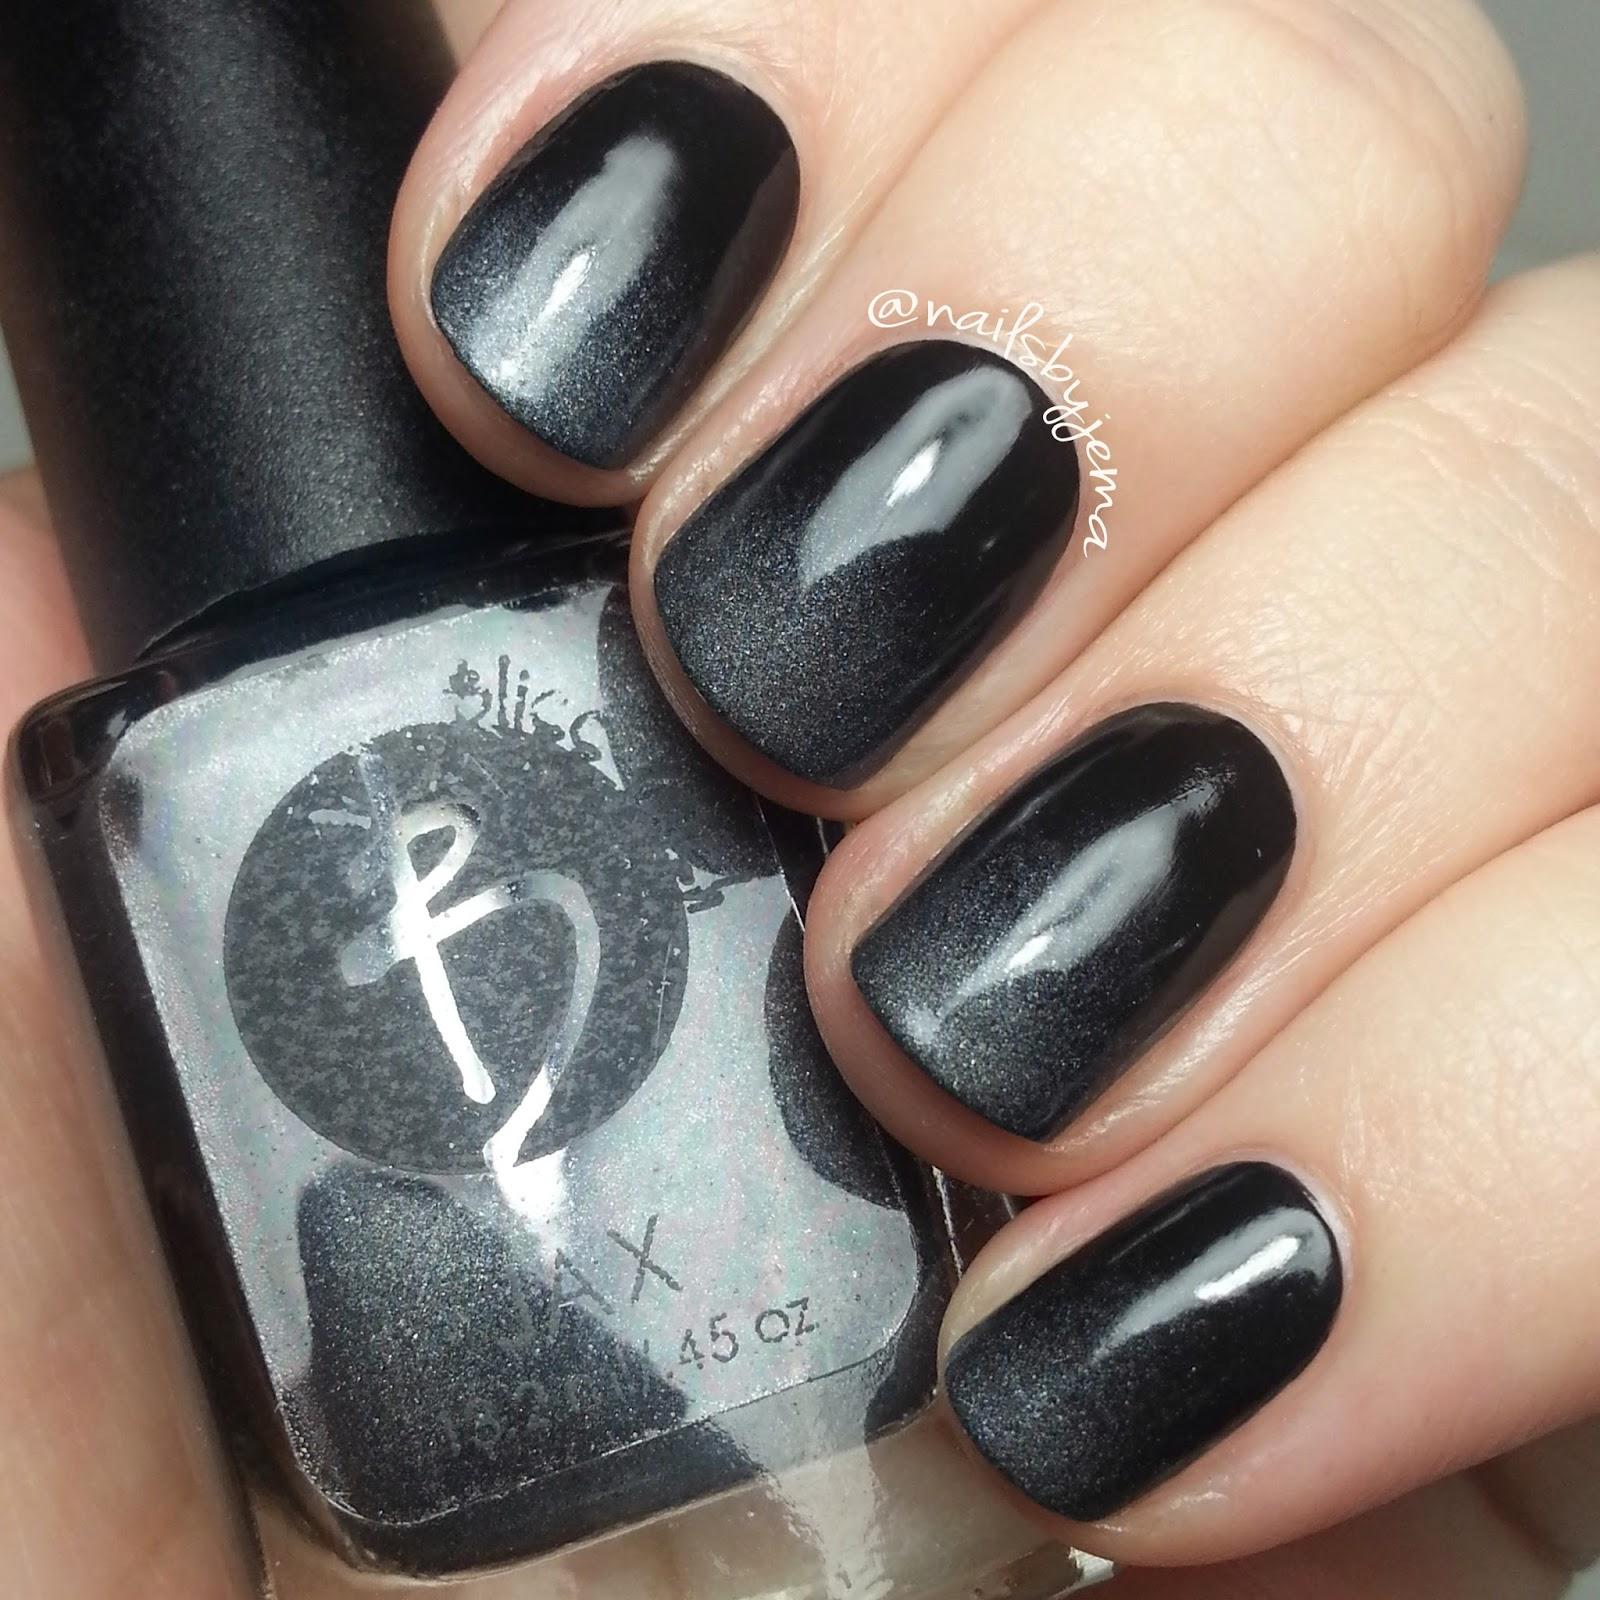 Black Onyx Opi Matte Nail Polish - Creative Touch